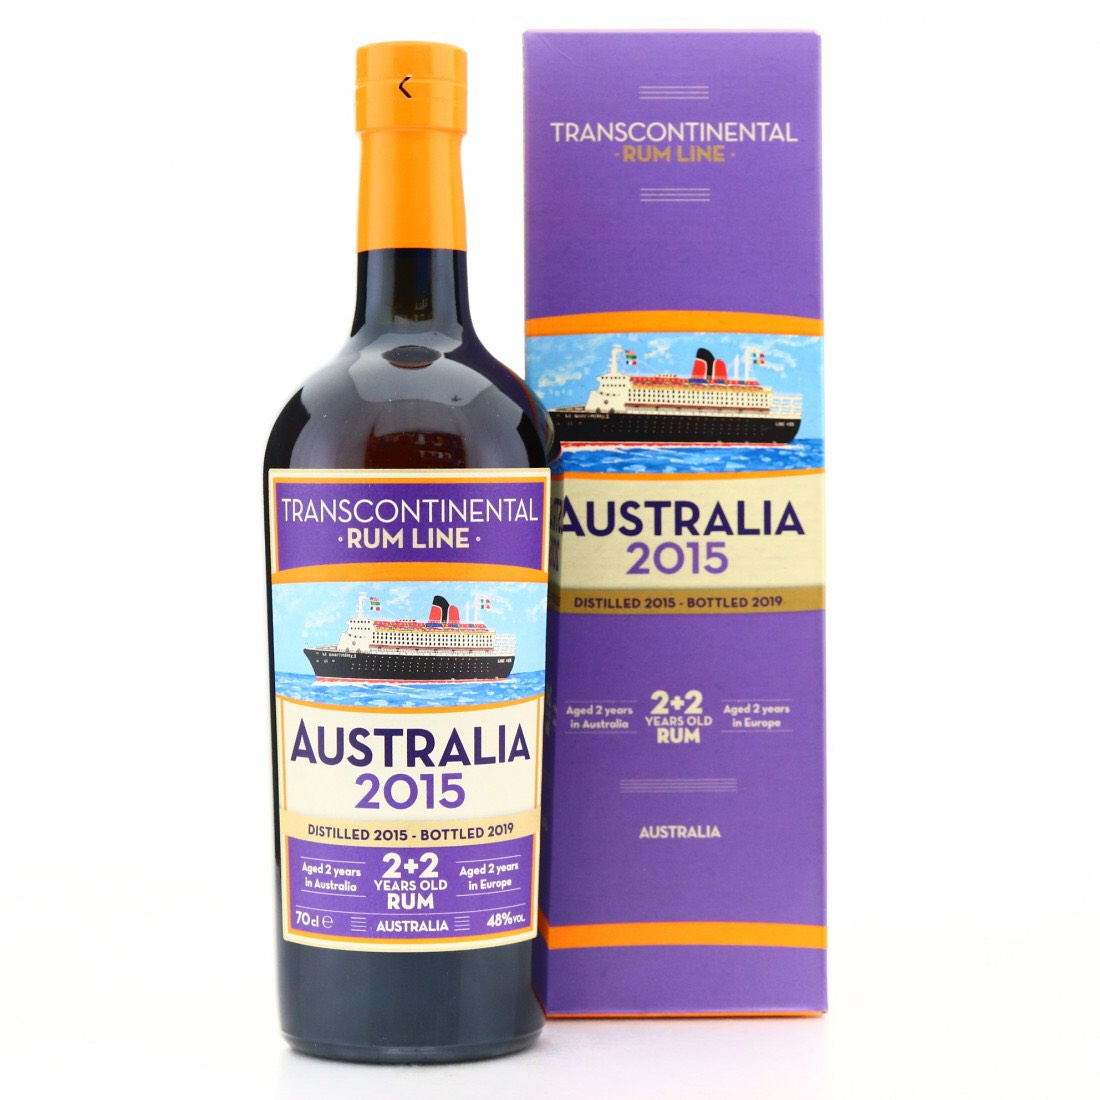 Bottle image of Australia